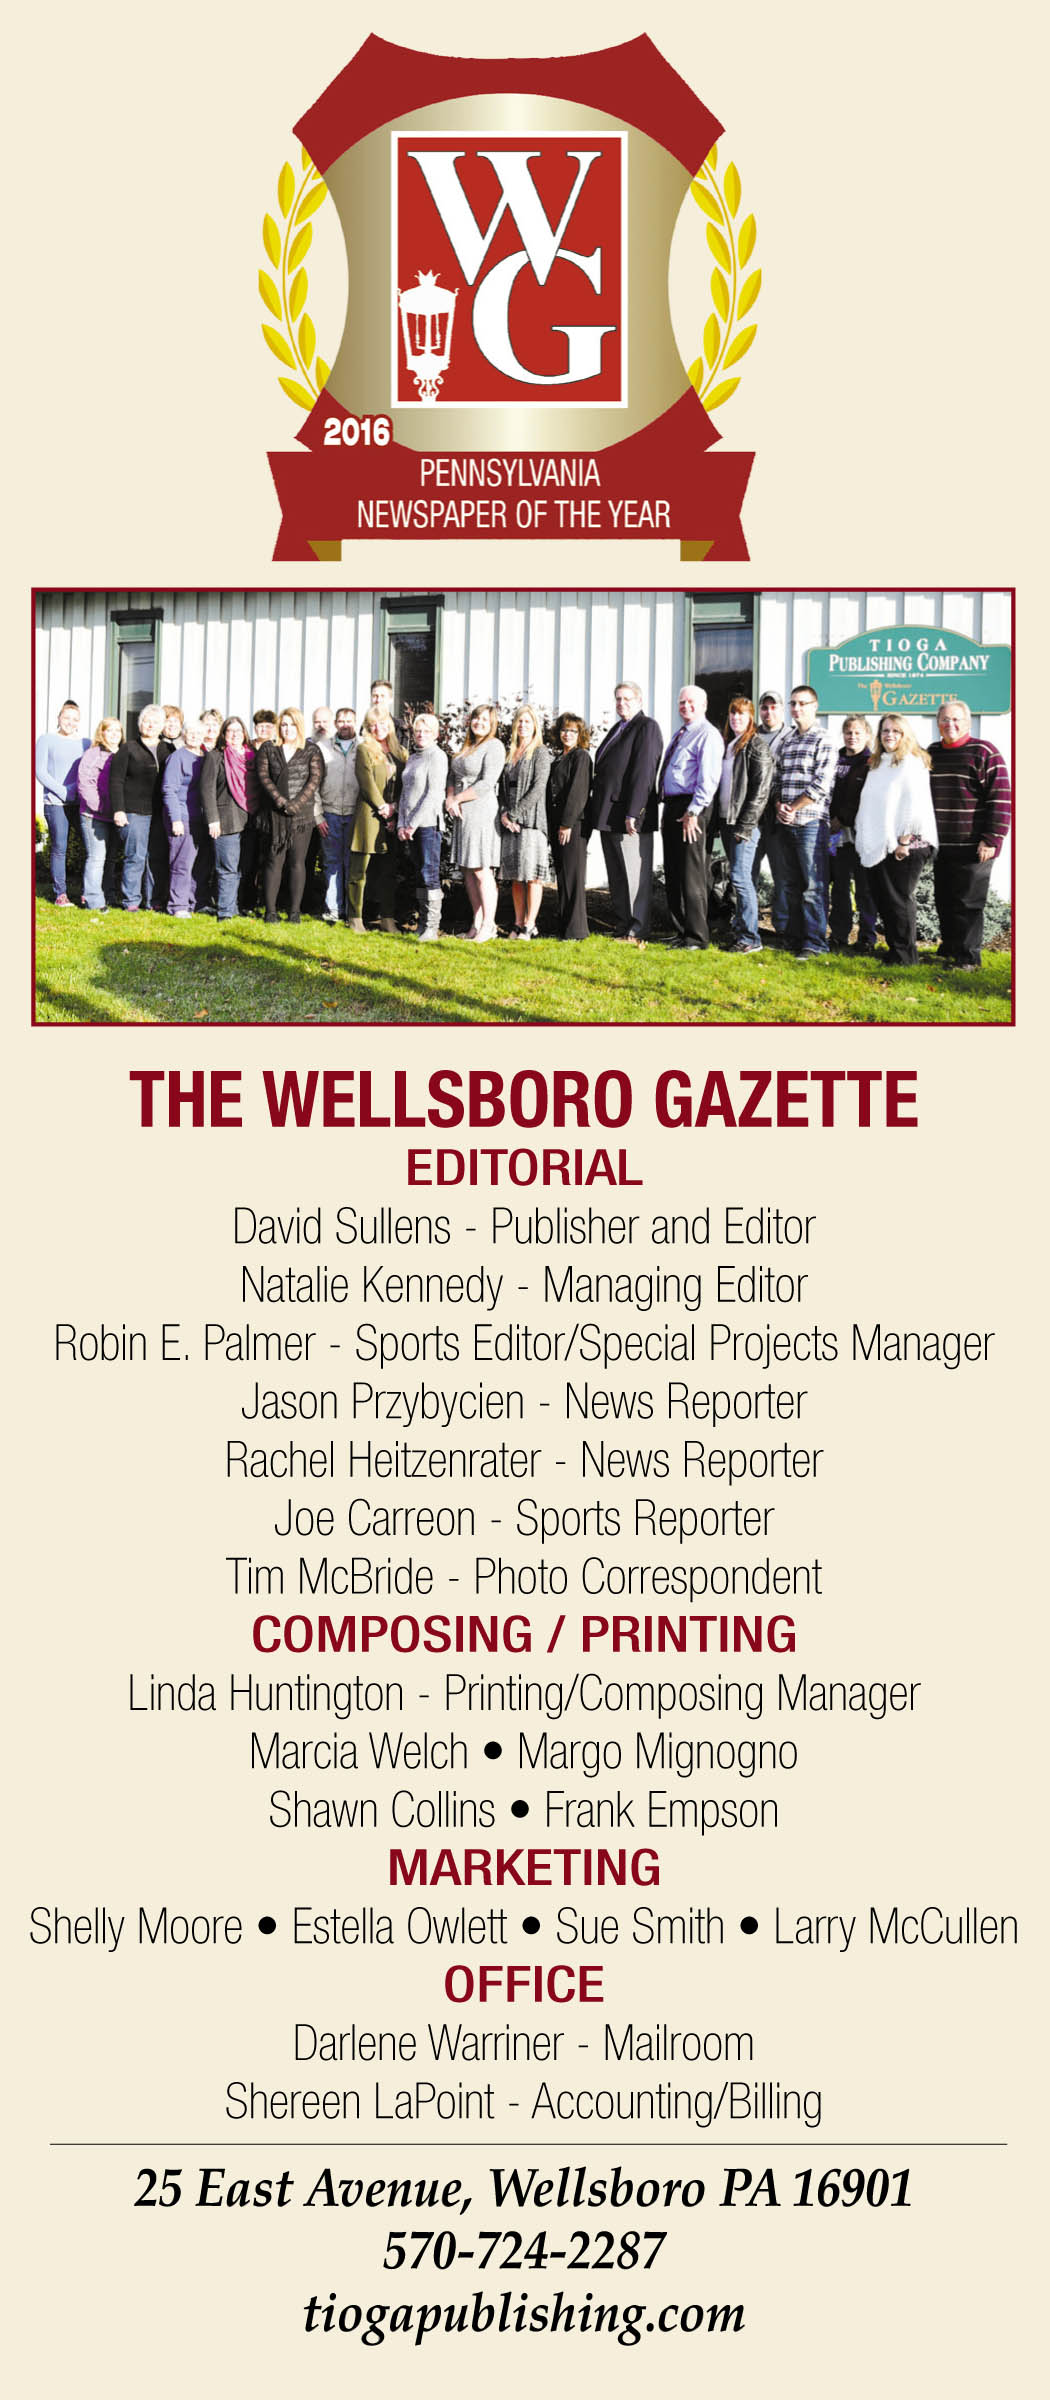 Newspaper of the Year masthead